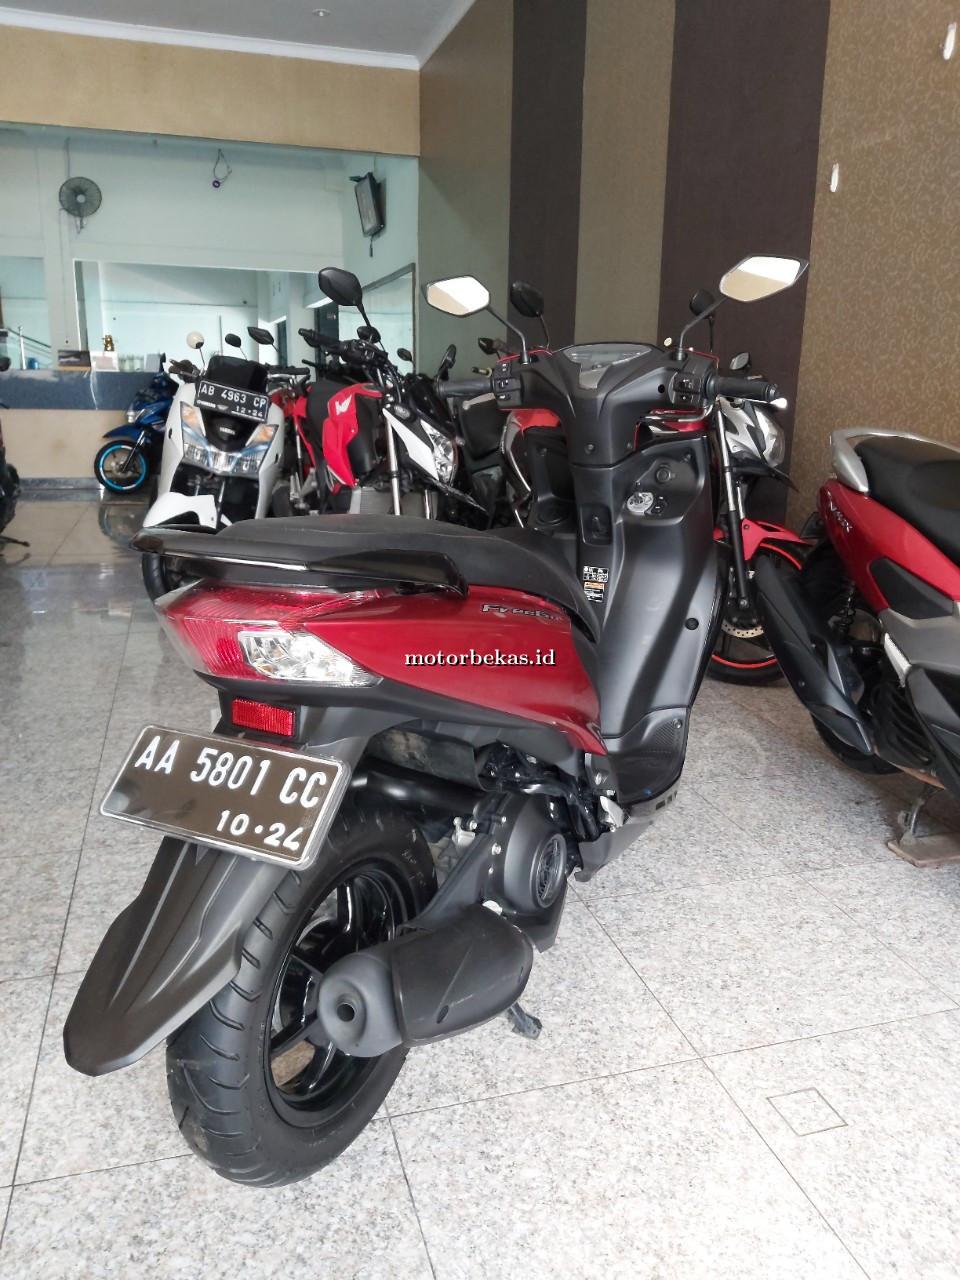 YAMAHA FREE GO  68 motorbekas.id